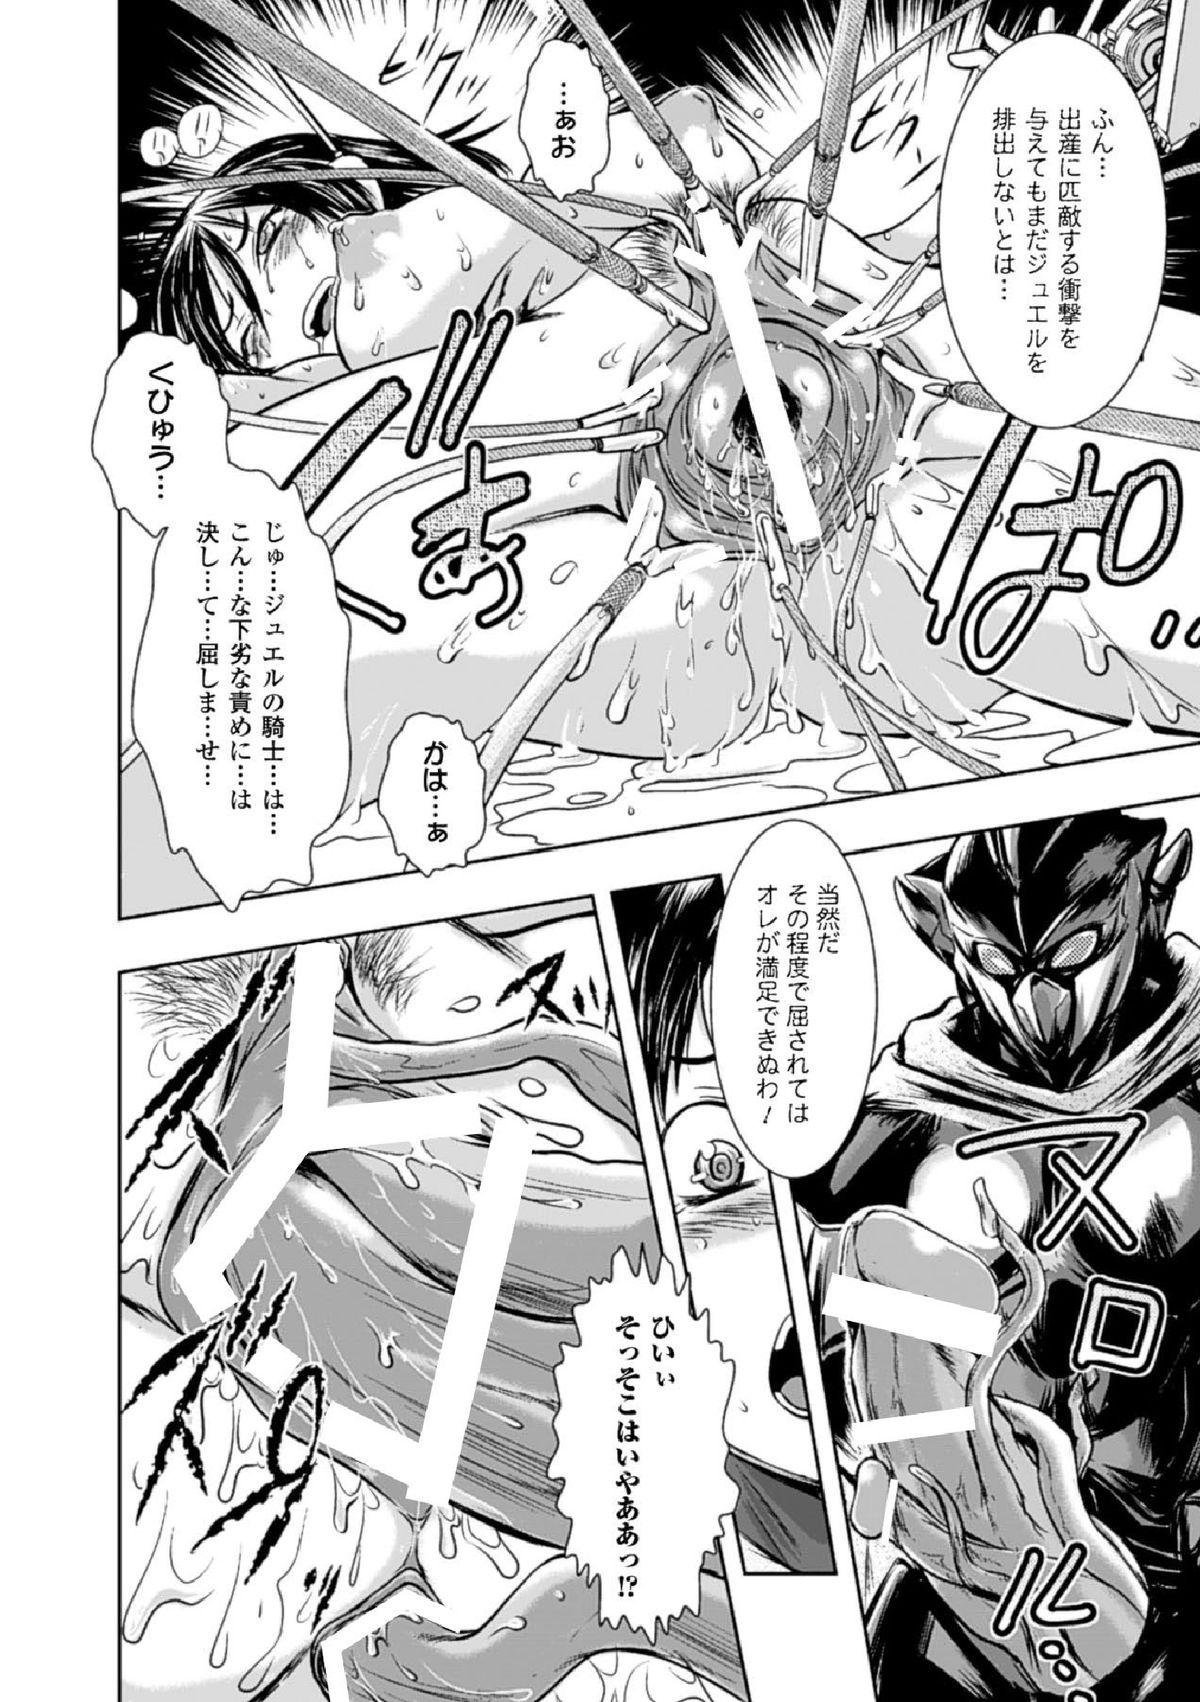 Haiboku Heroine Kaizou Choukyou Inferno 15